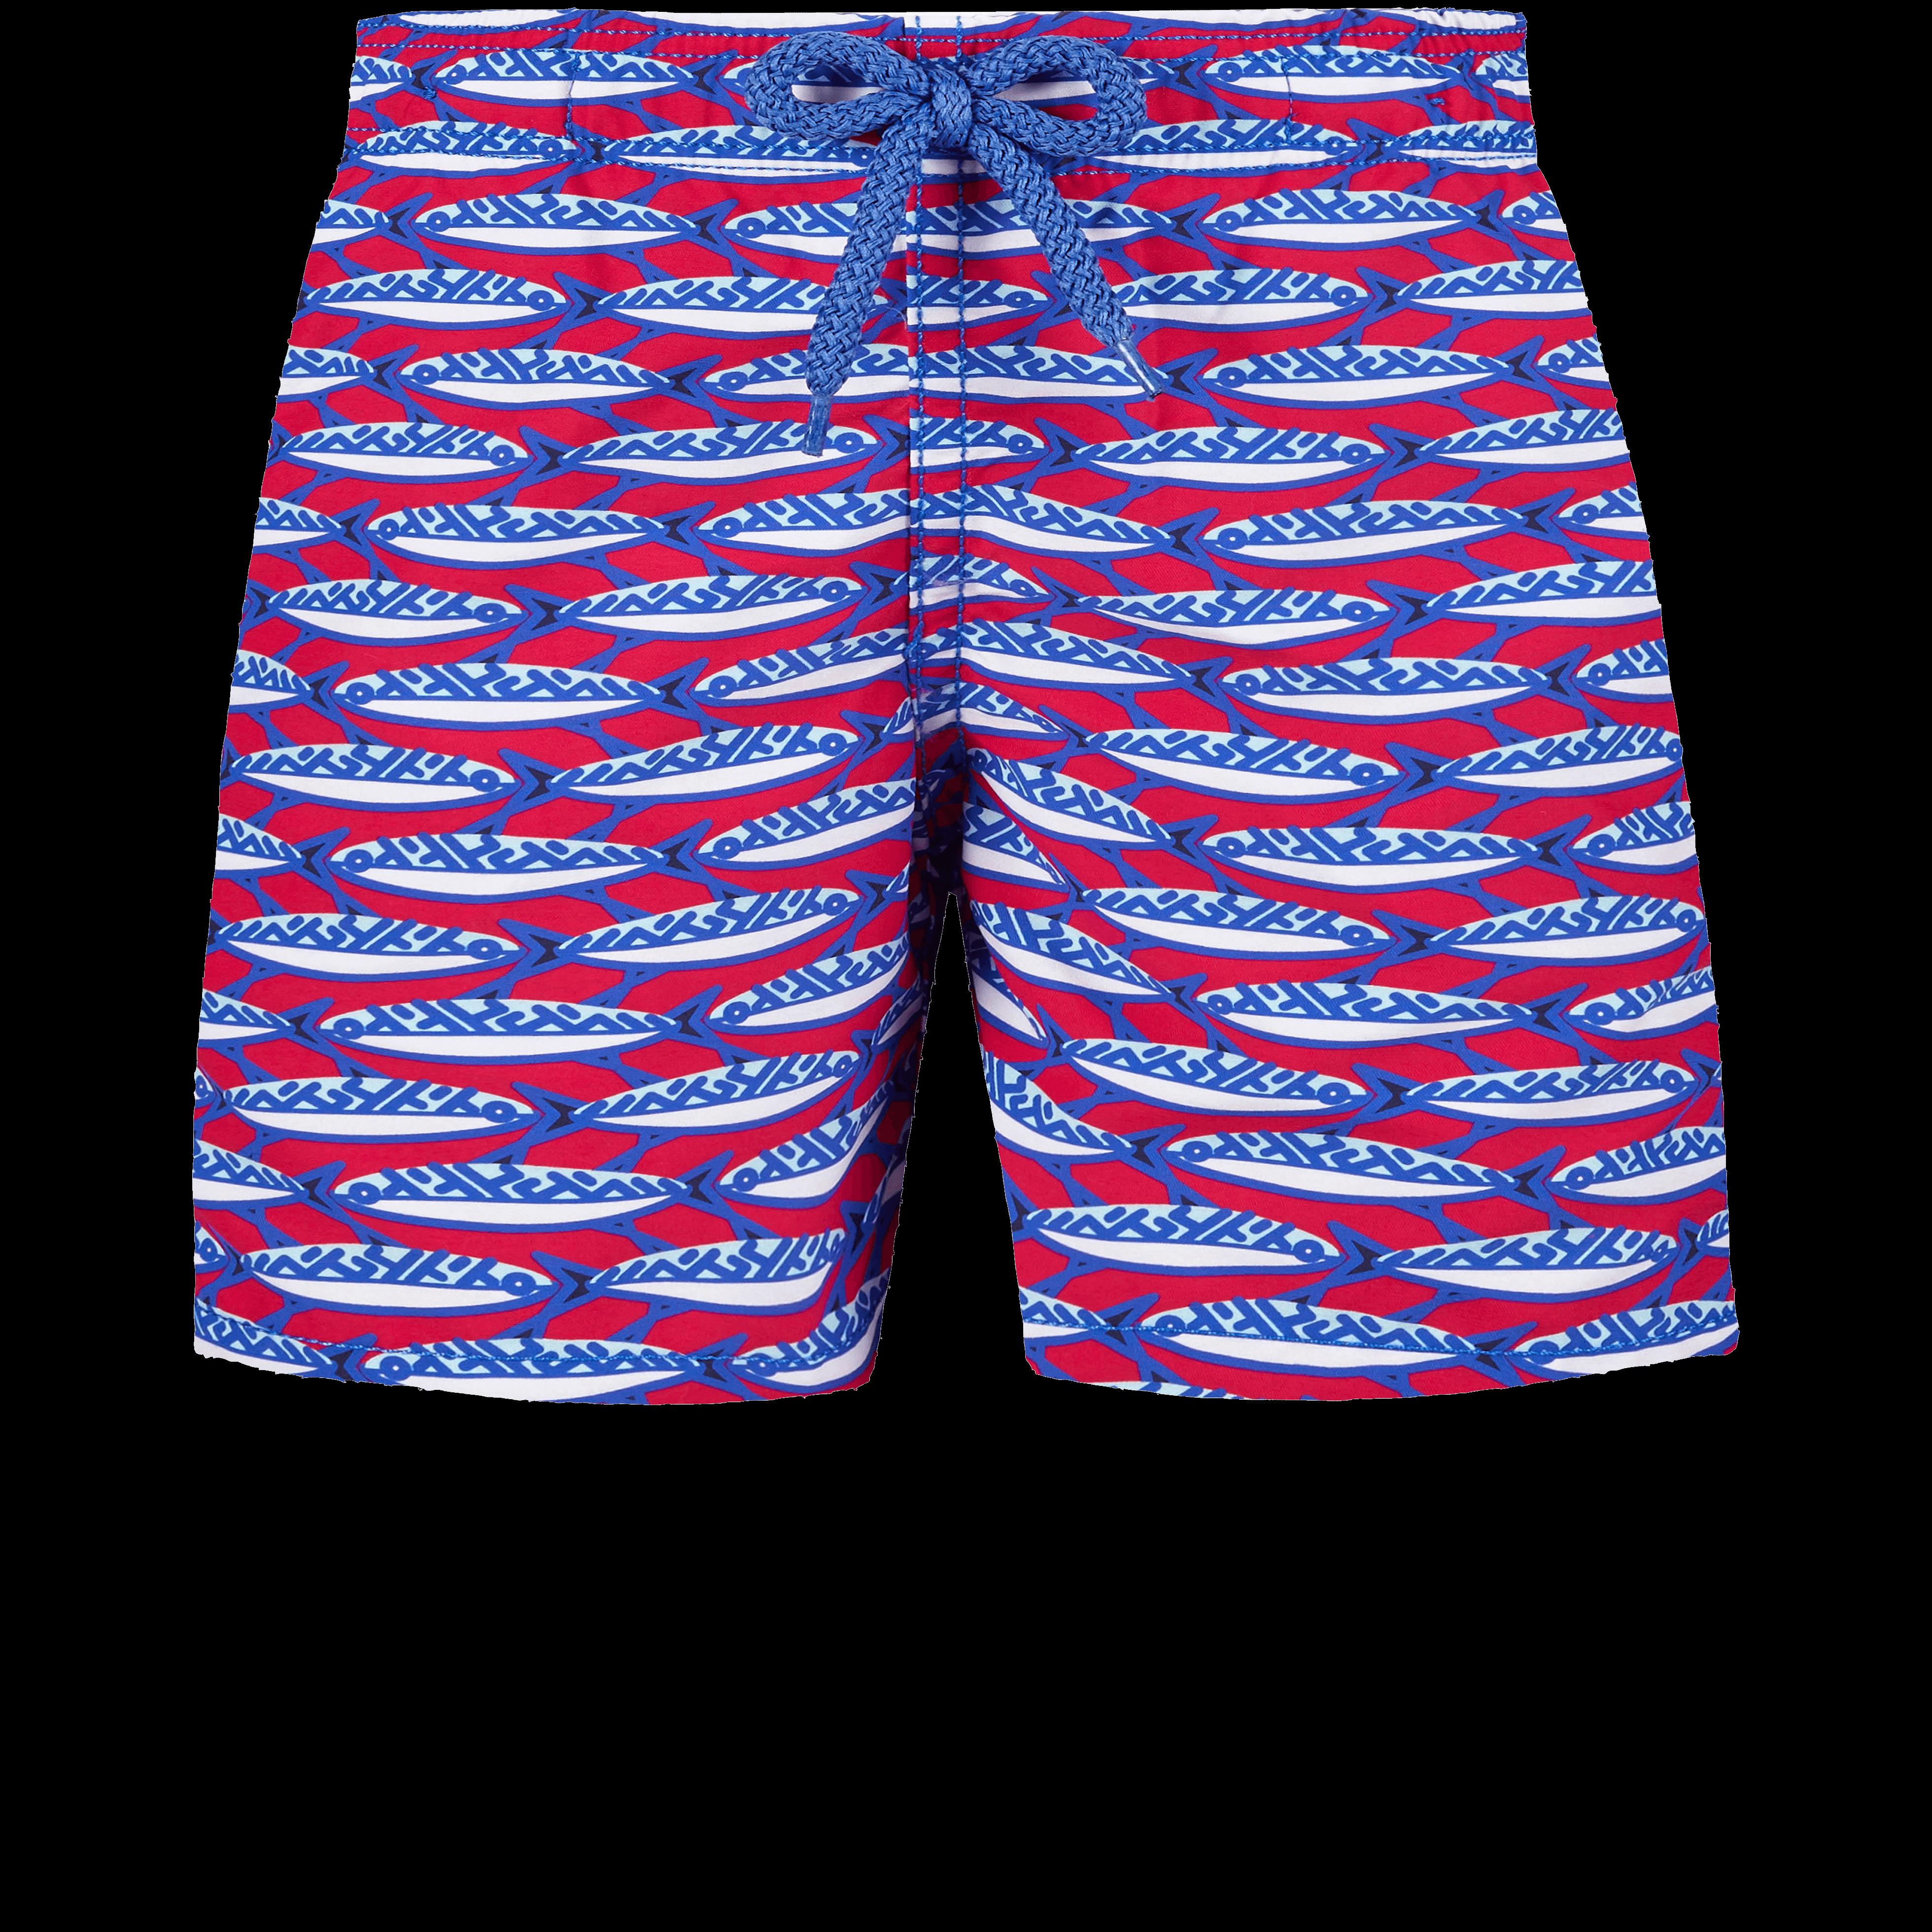 VILEBREQUIN | Boys Swimwear - Boys Swimwear Marbella - SWIMMING TRUNK - JIM - Red - 14 - Vilebrequin | Goxip